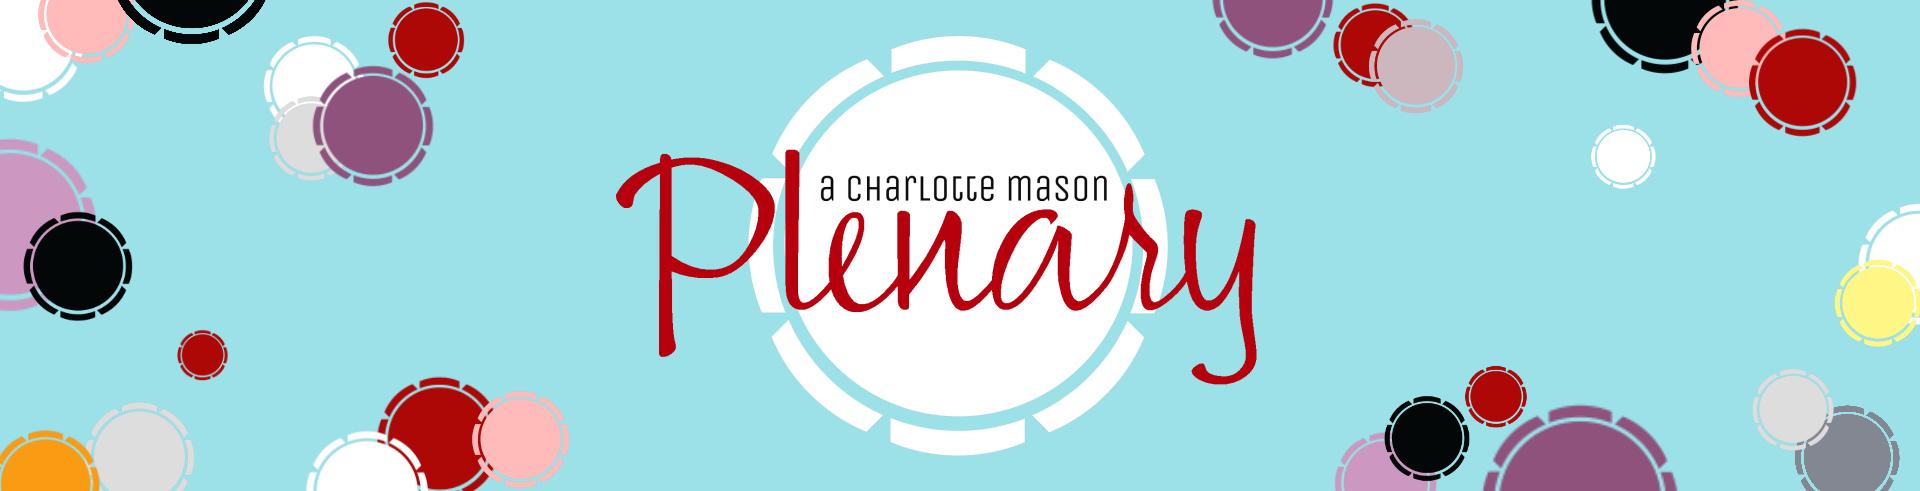 A Charlotte Mason Plenary